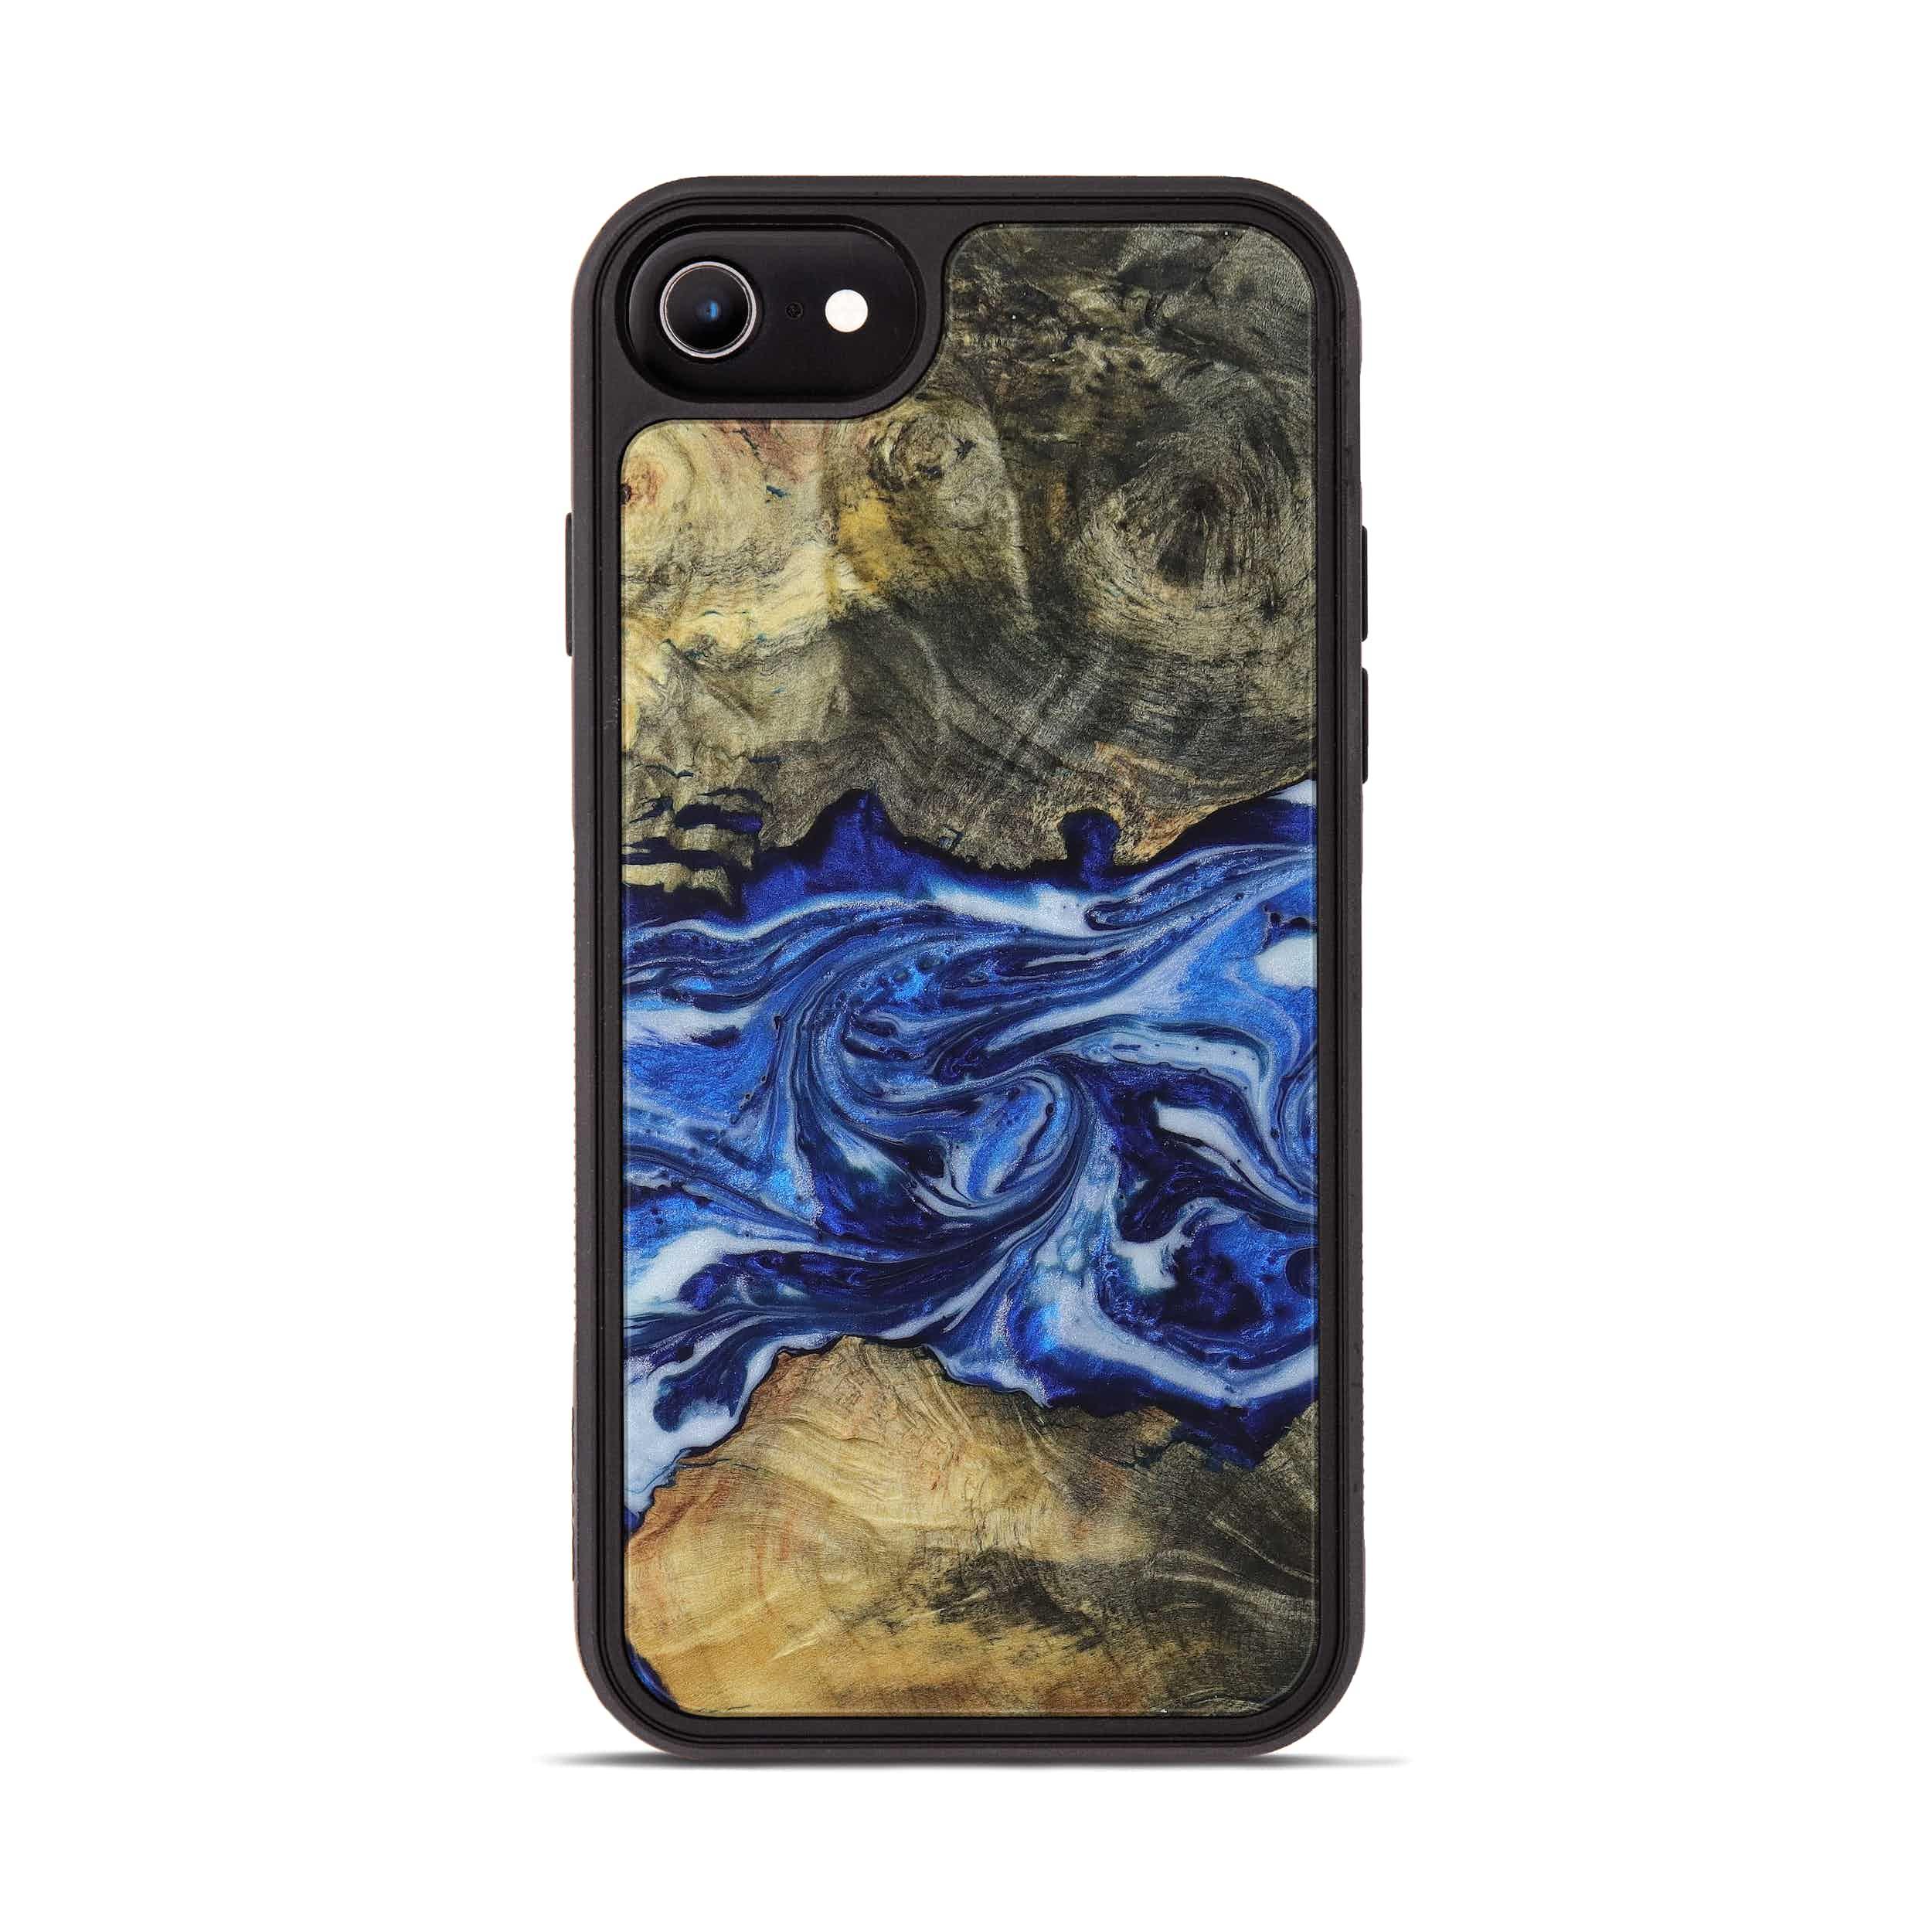 iPhone 6s Wood+Resin Phone Case - Karil (Dark Blue, 396096)